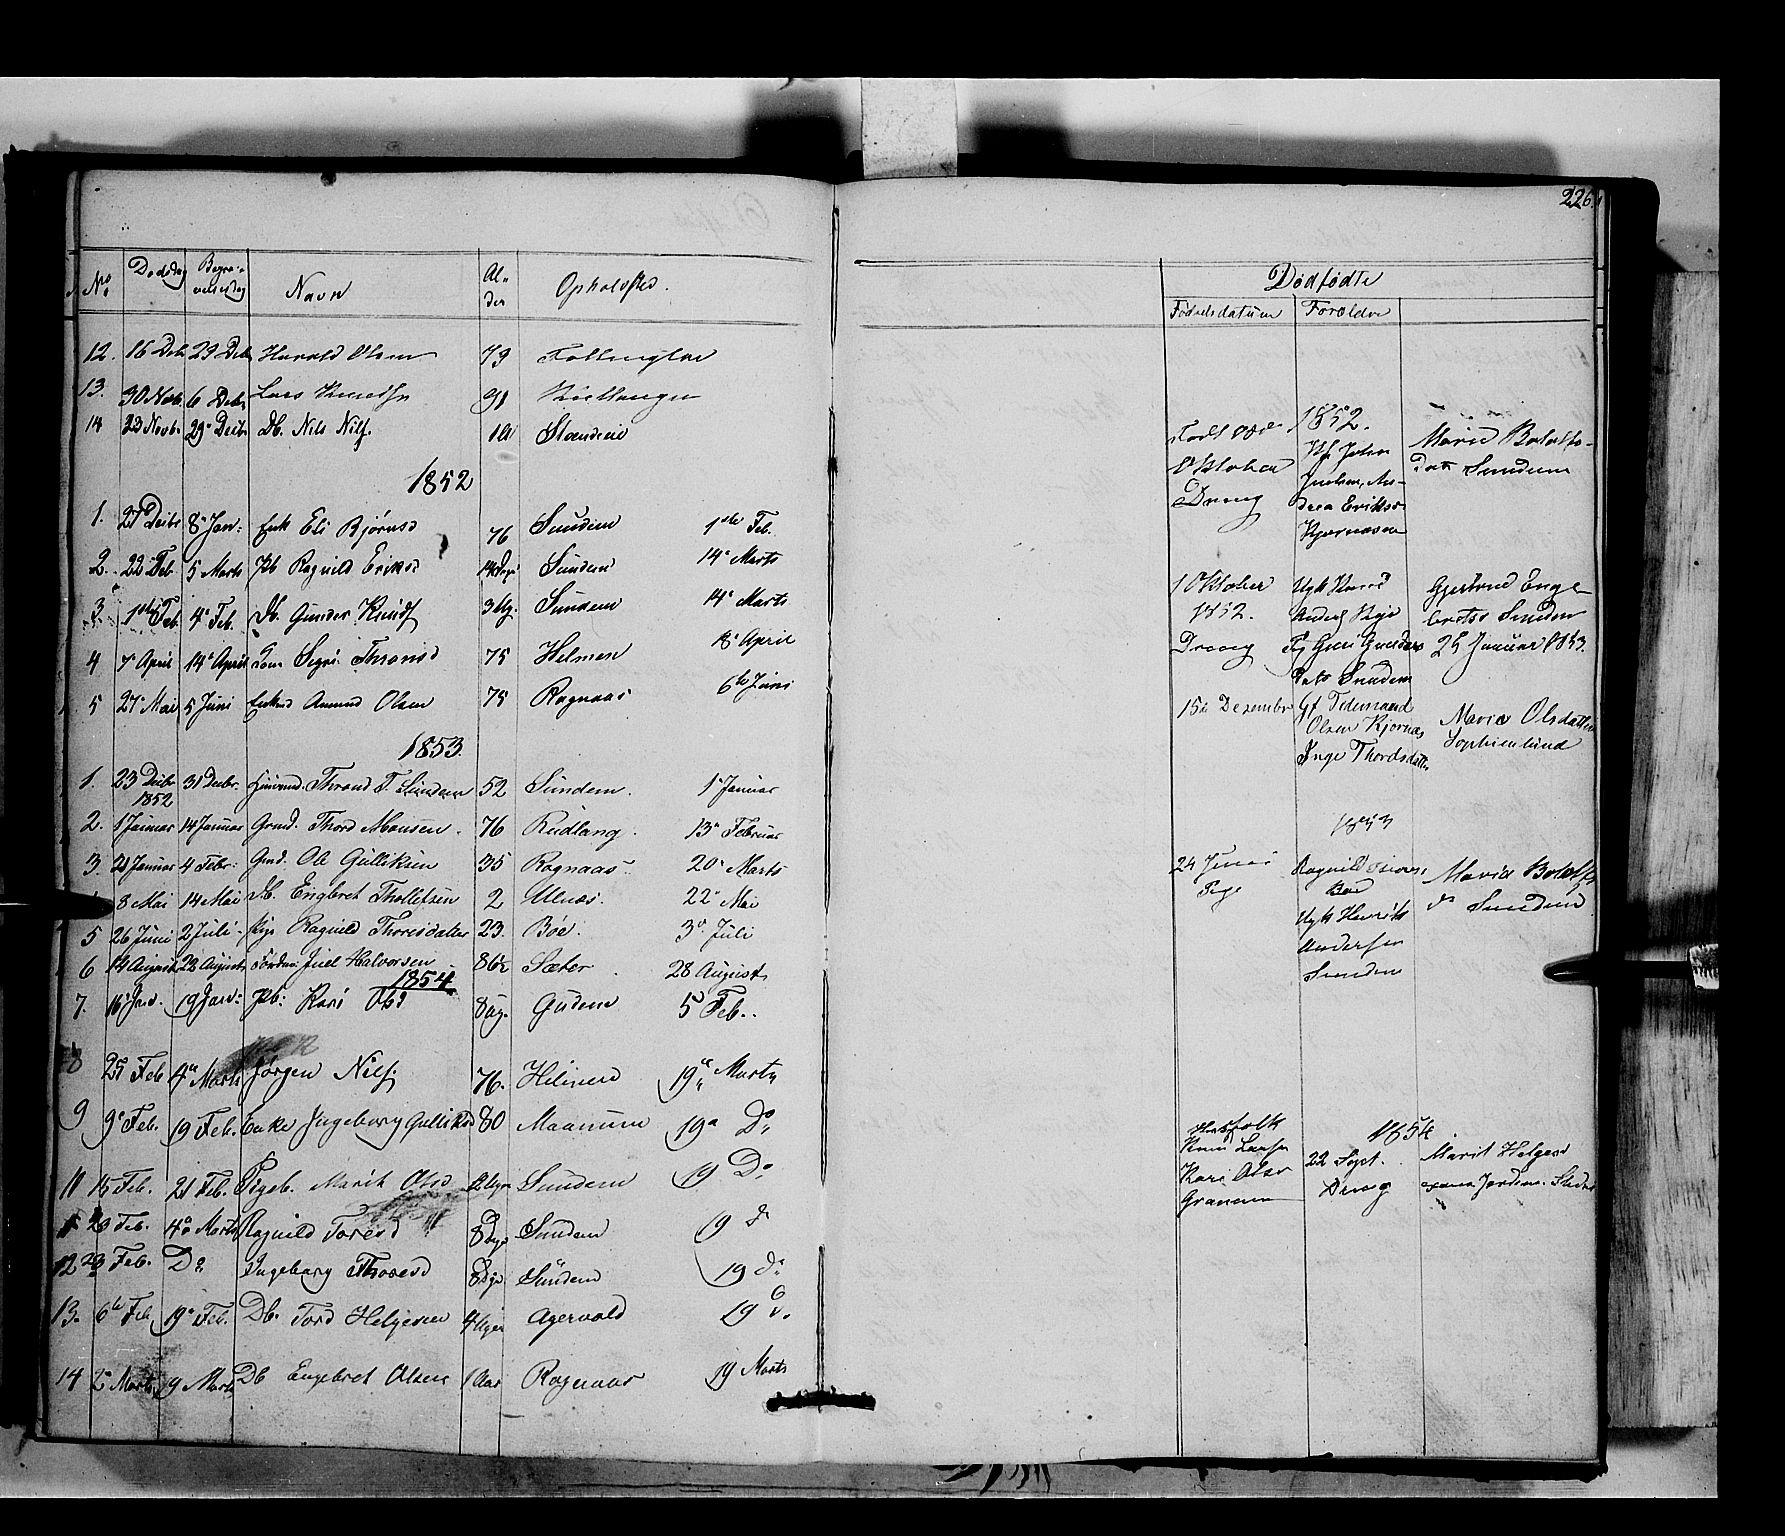 SAH, Nord-Aurdal prestekontor, Ministerialbok nr. 6, 1842-1863, s. 226